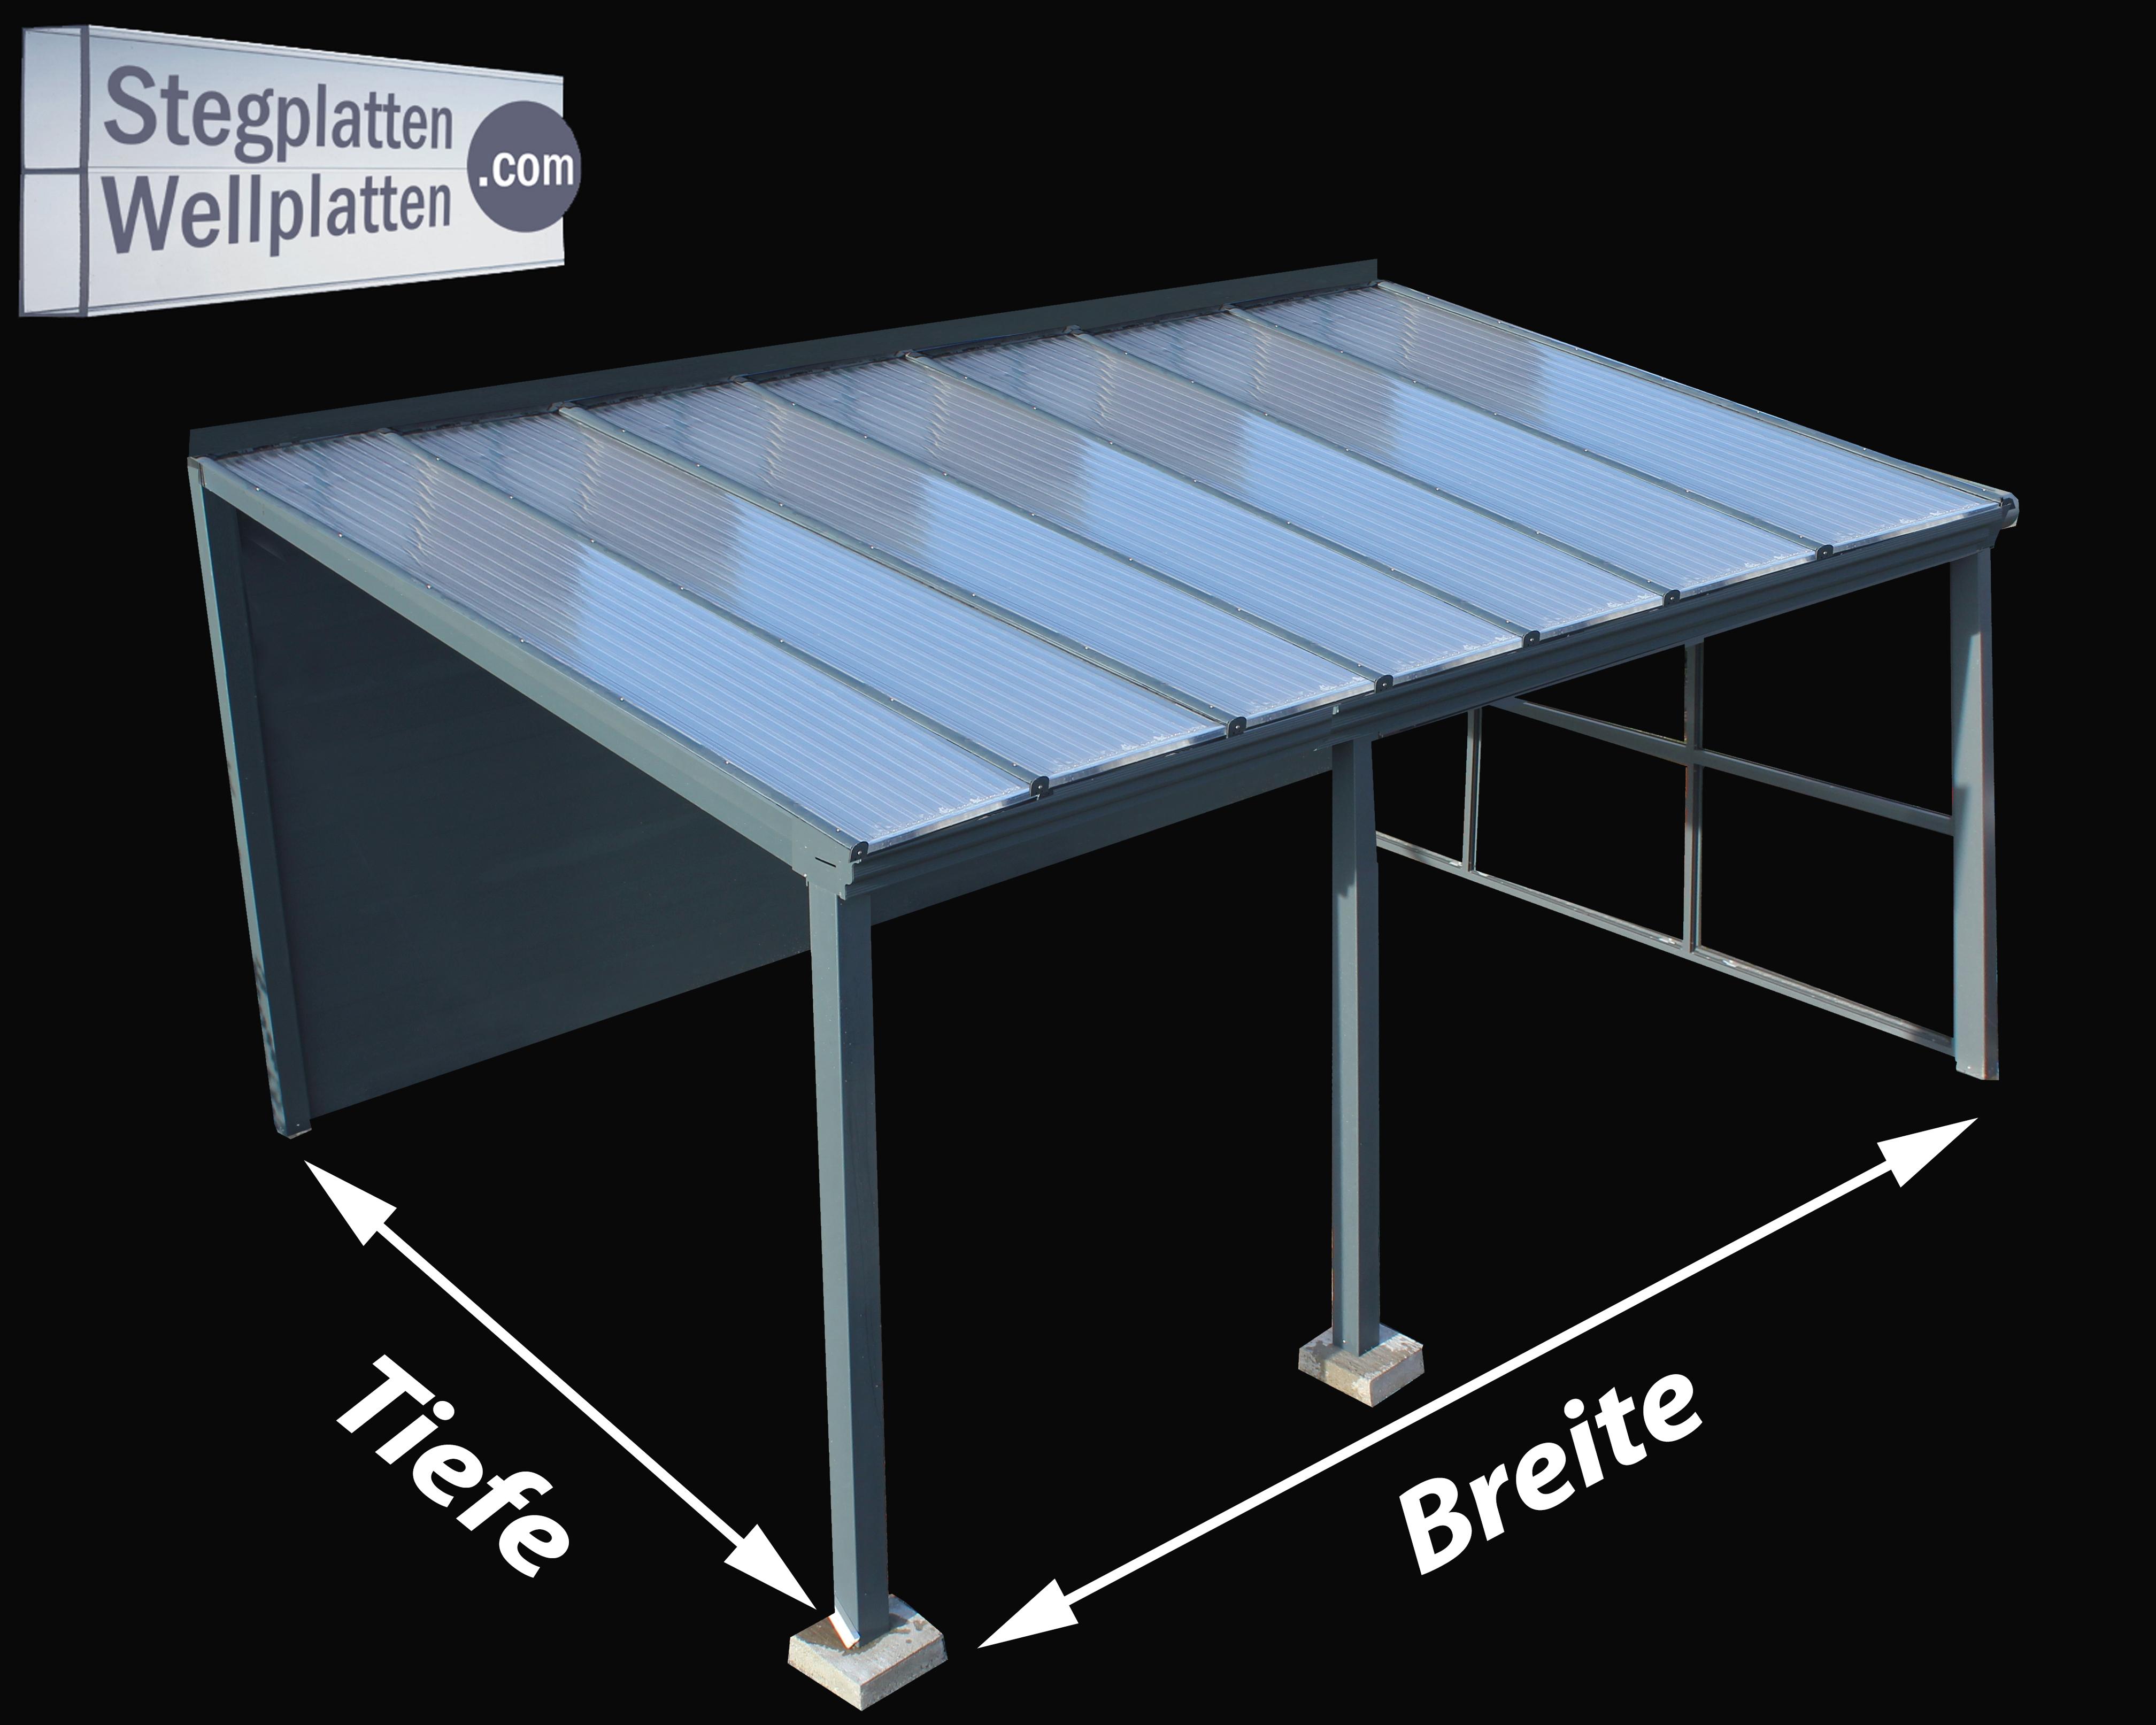 Bausatz Terrassenuberdachung Carport Stegplatten